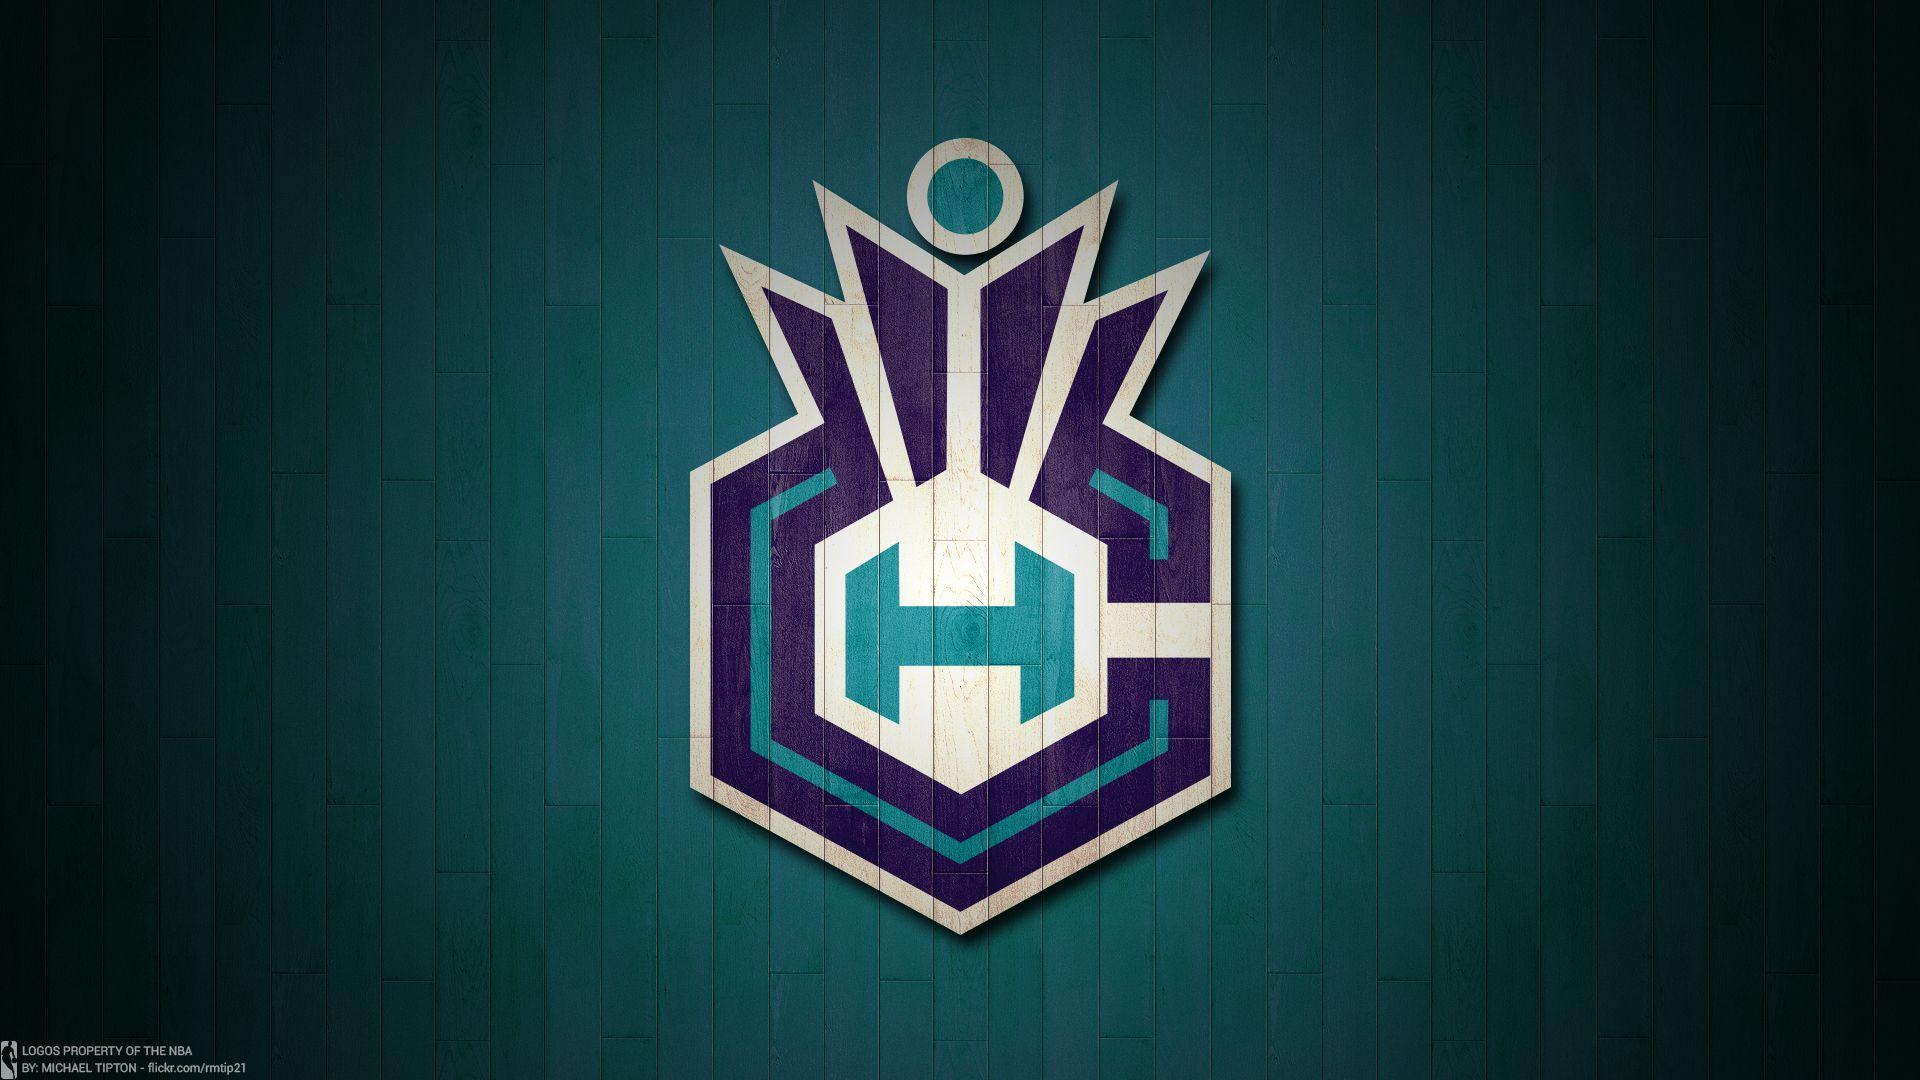 Charlotte Hornets 2017 NBA HD 4k Wallpapers